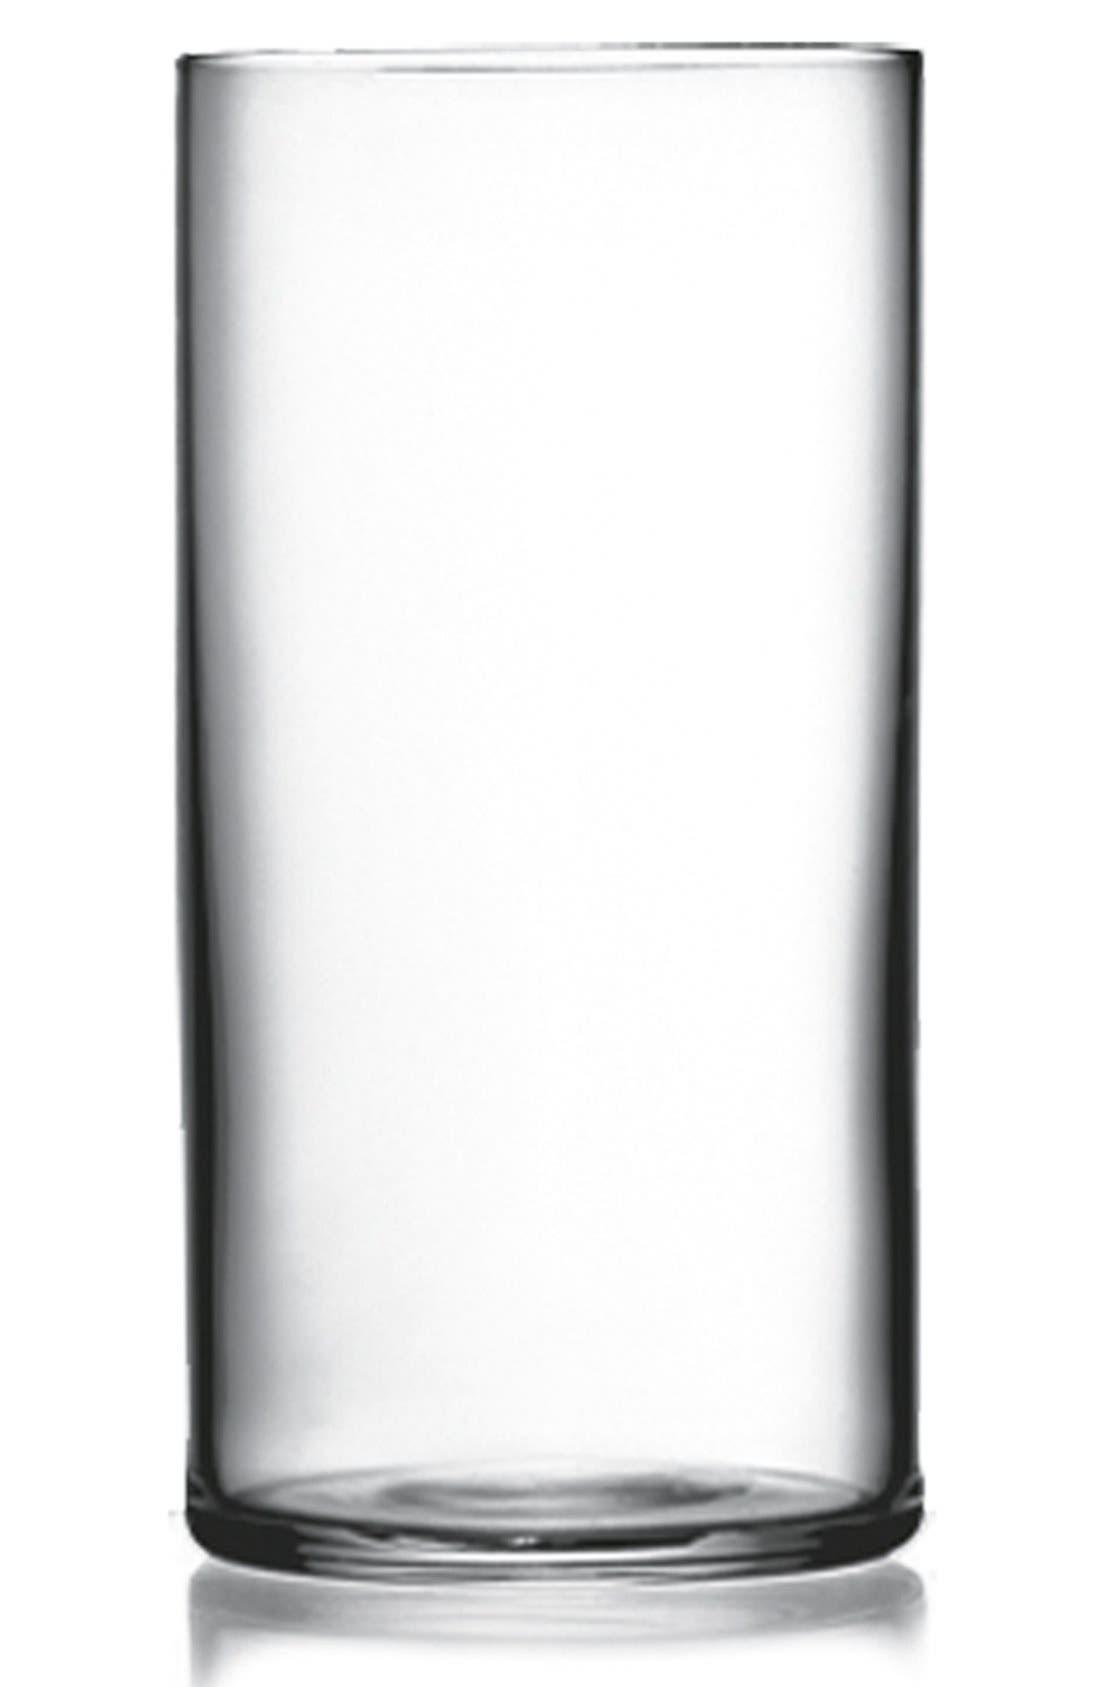 Alternate Image 1 Selected - Luigi Bormioli 'Top Class' Beverage Glasses (Set of 6)